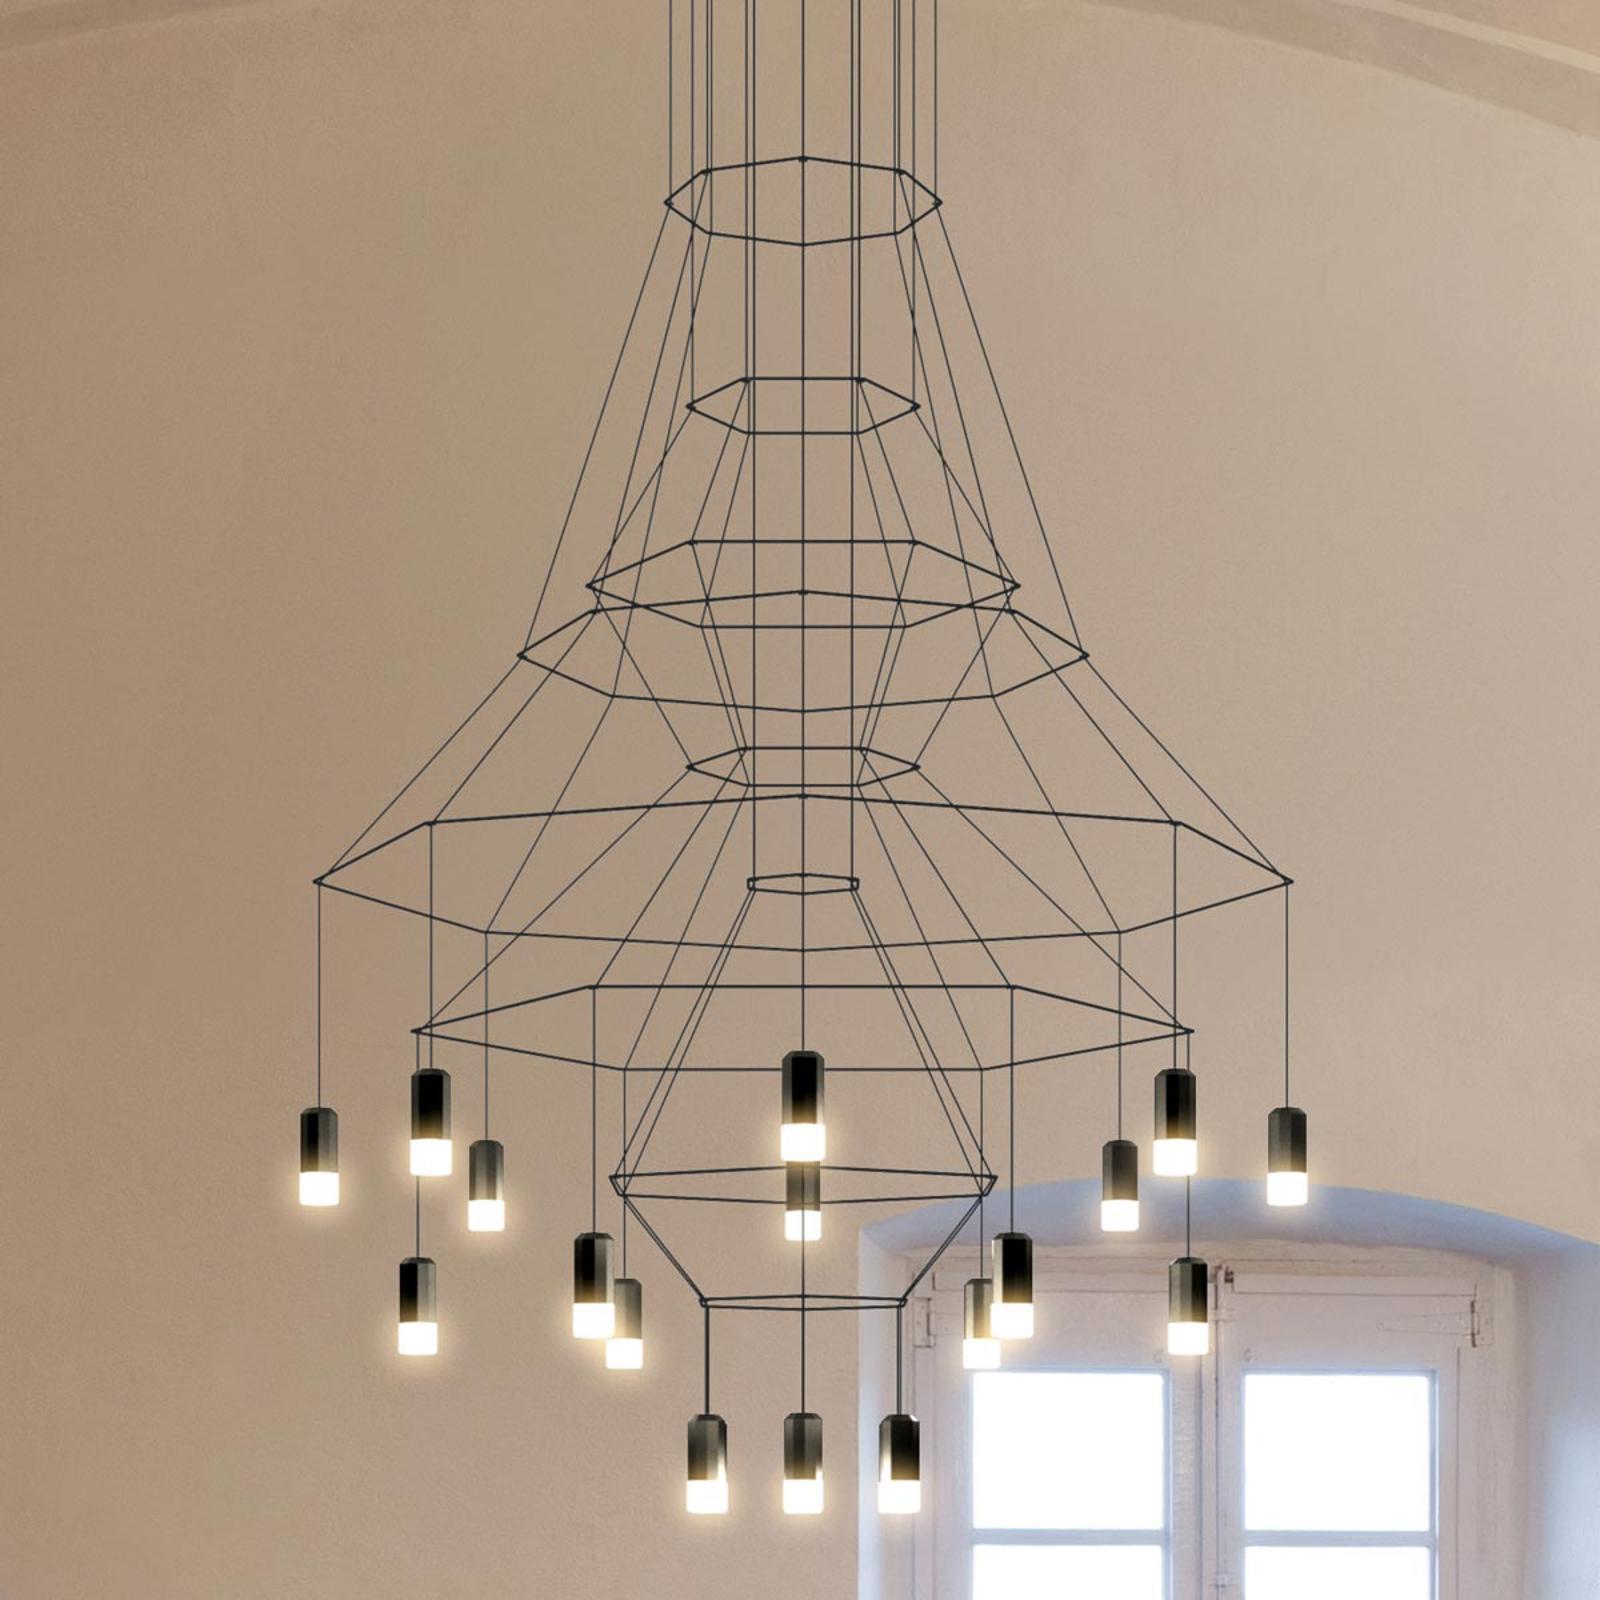 LED-Pendelleuchte Vibia Wireflow, schwarz, 279 cm